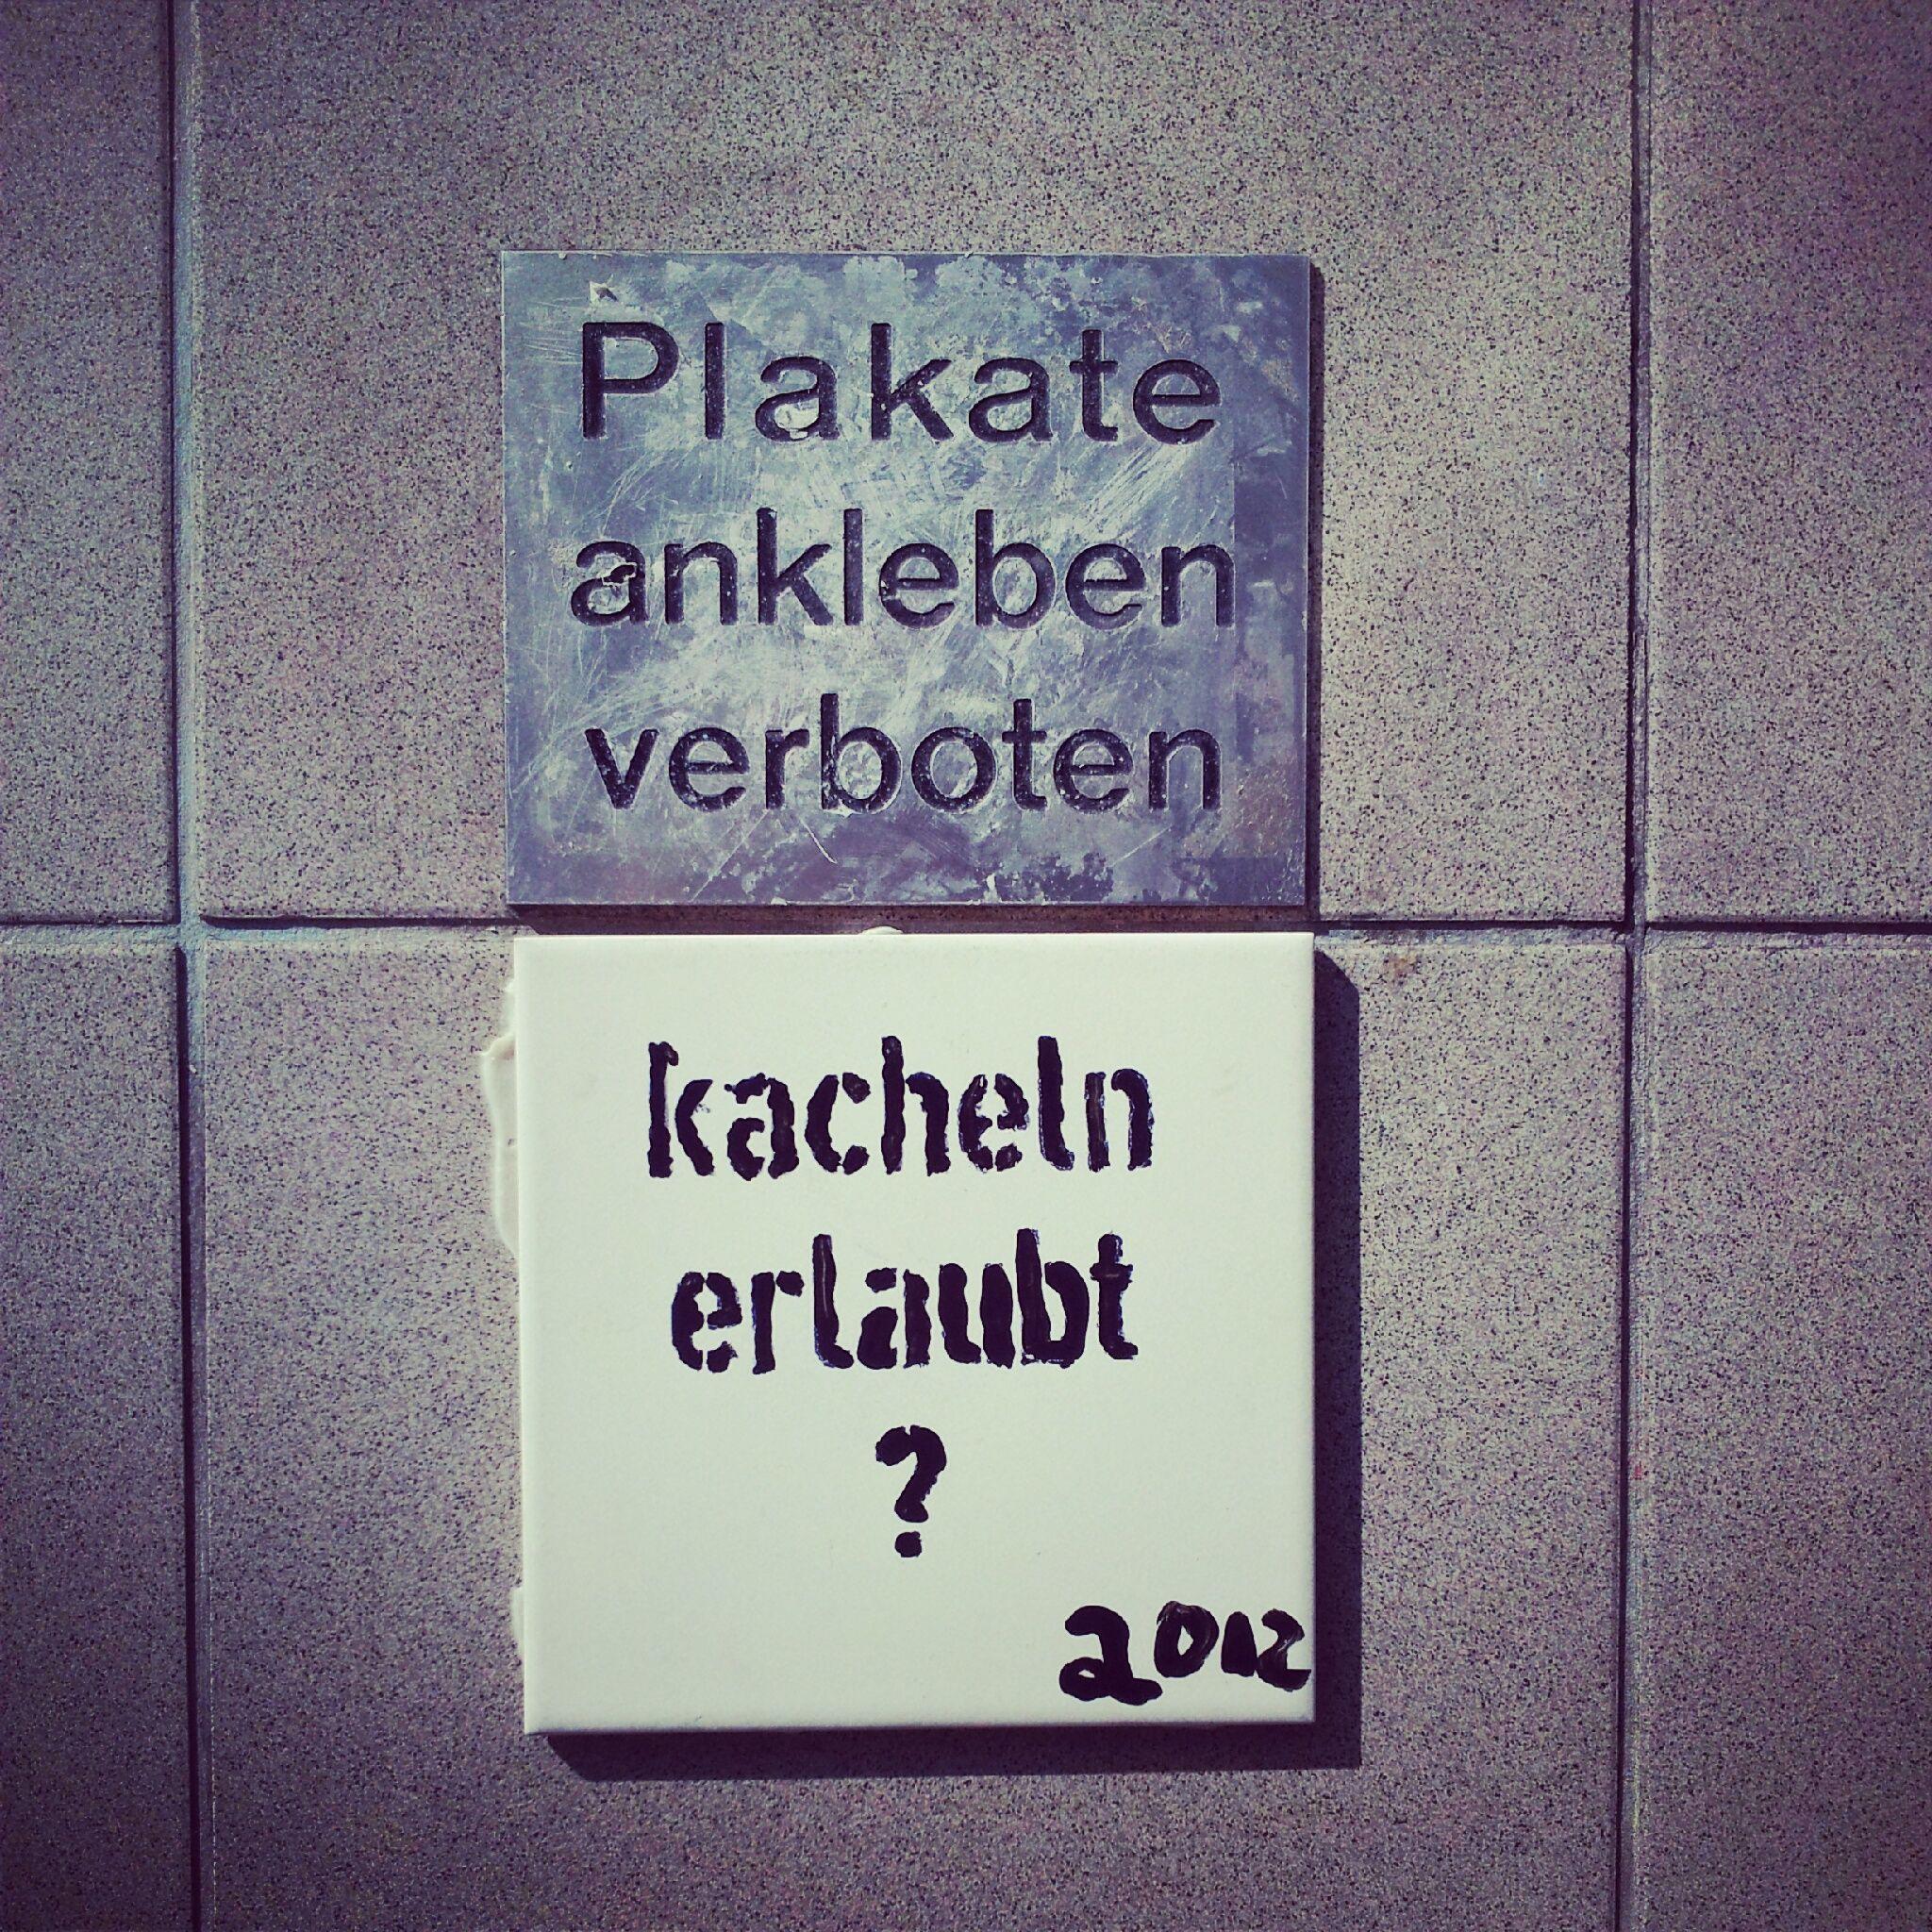 Plakate ankleben verboten - Kacheln erlaubt? #streetart